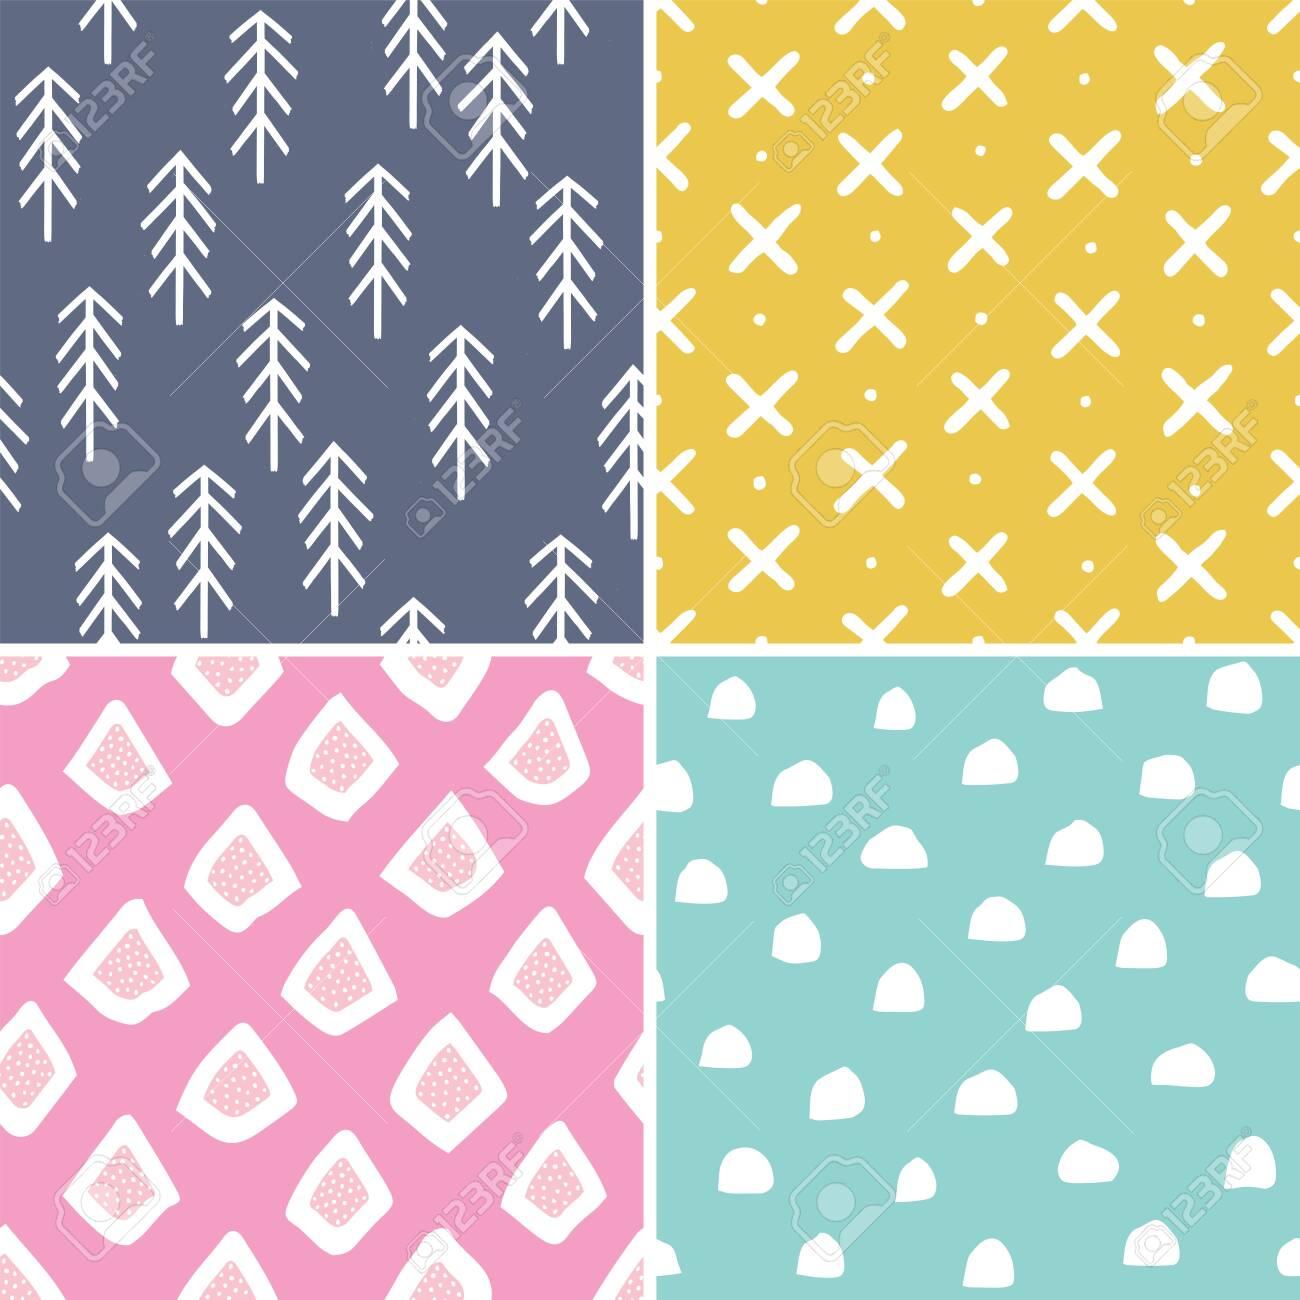 Cute Design Backgrounds Kozenjasonkellyphotoco - pastel roblox clothes